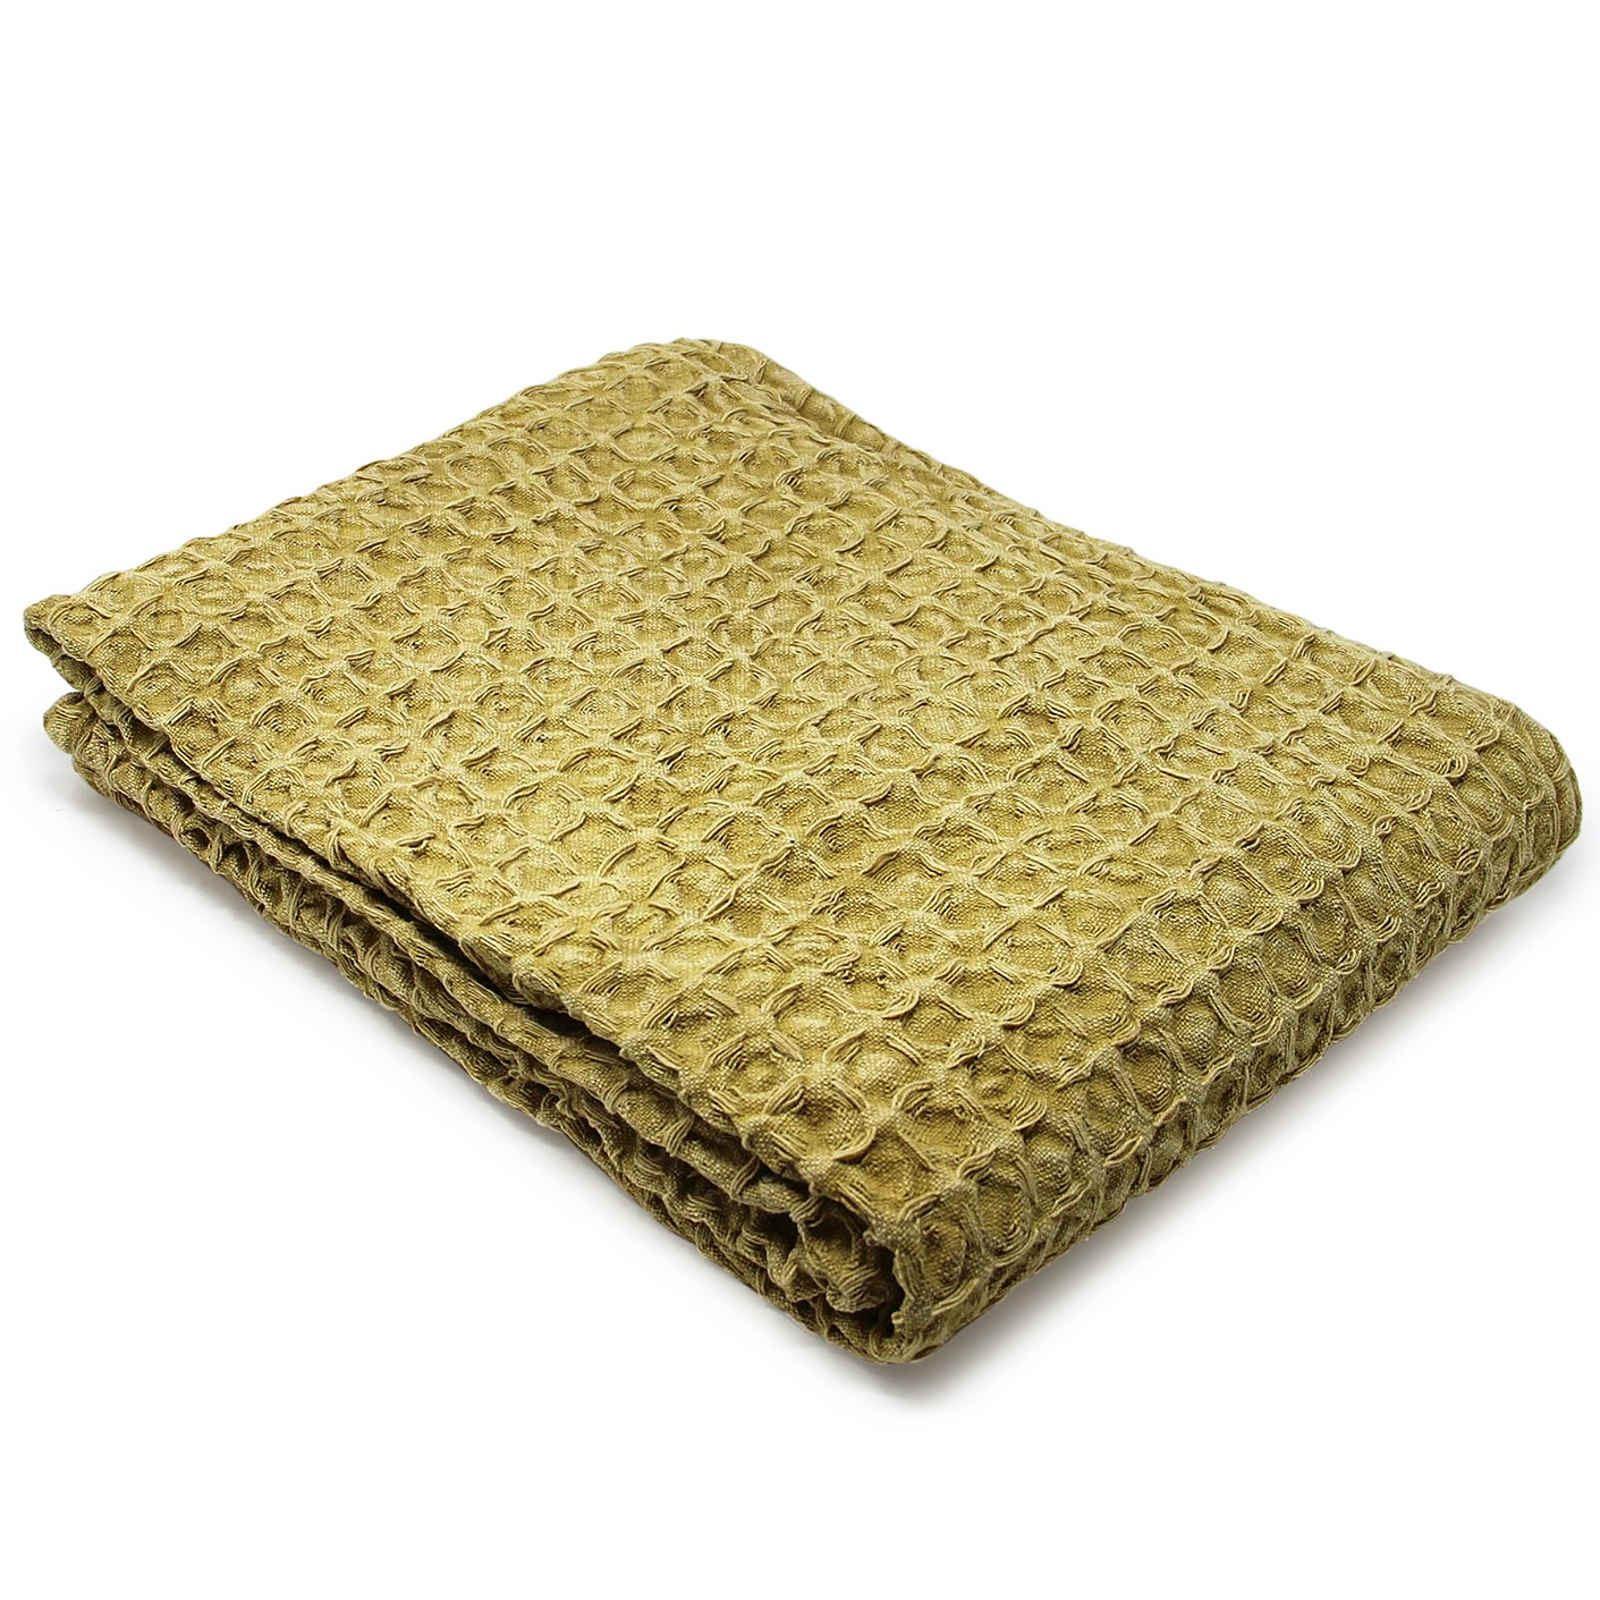 Oregon-Stonewash-Waffle-Throw-Modern-Distressed-Sofa-Bed-Blankets-100-Cotton thumbnail 15